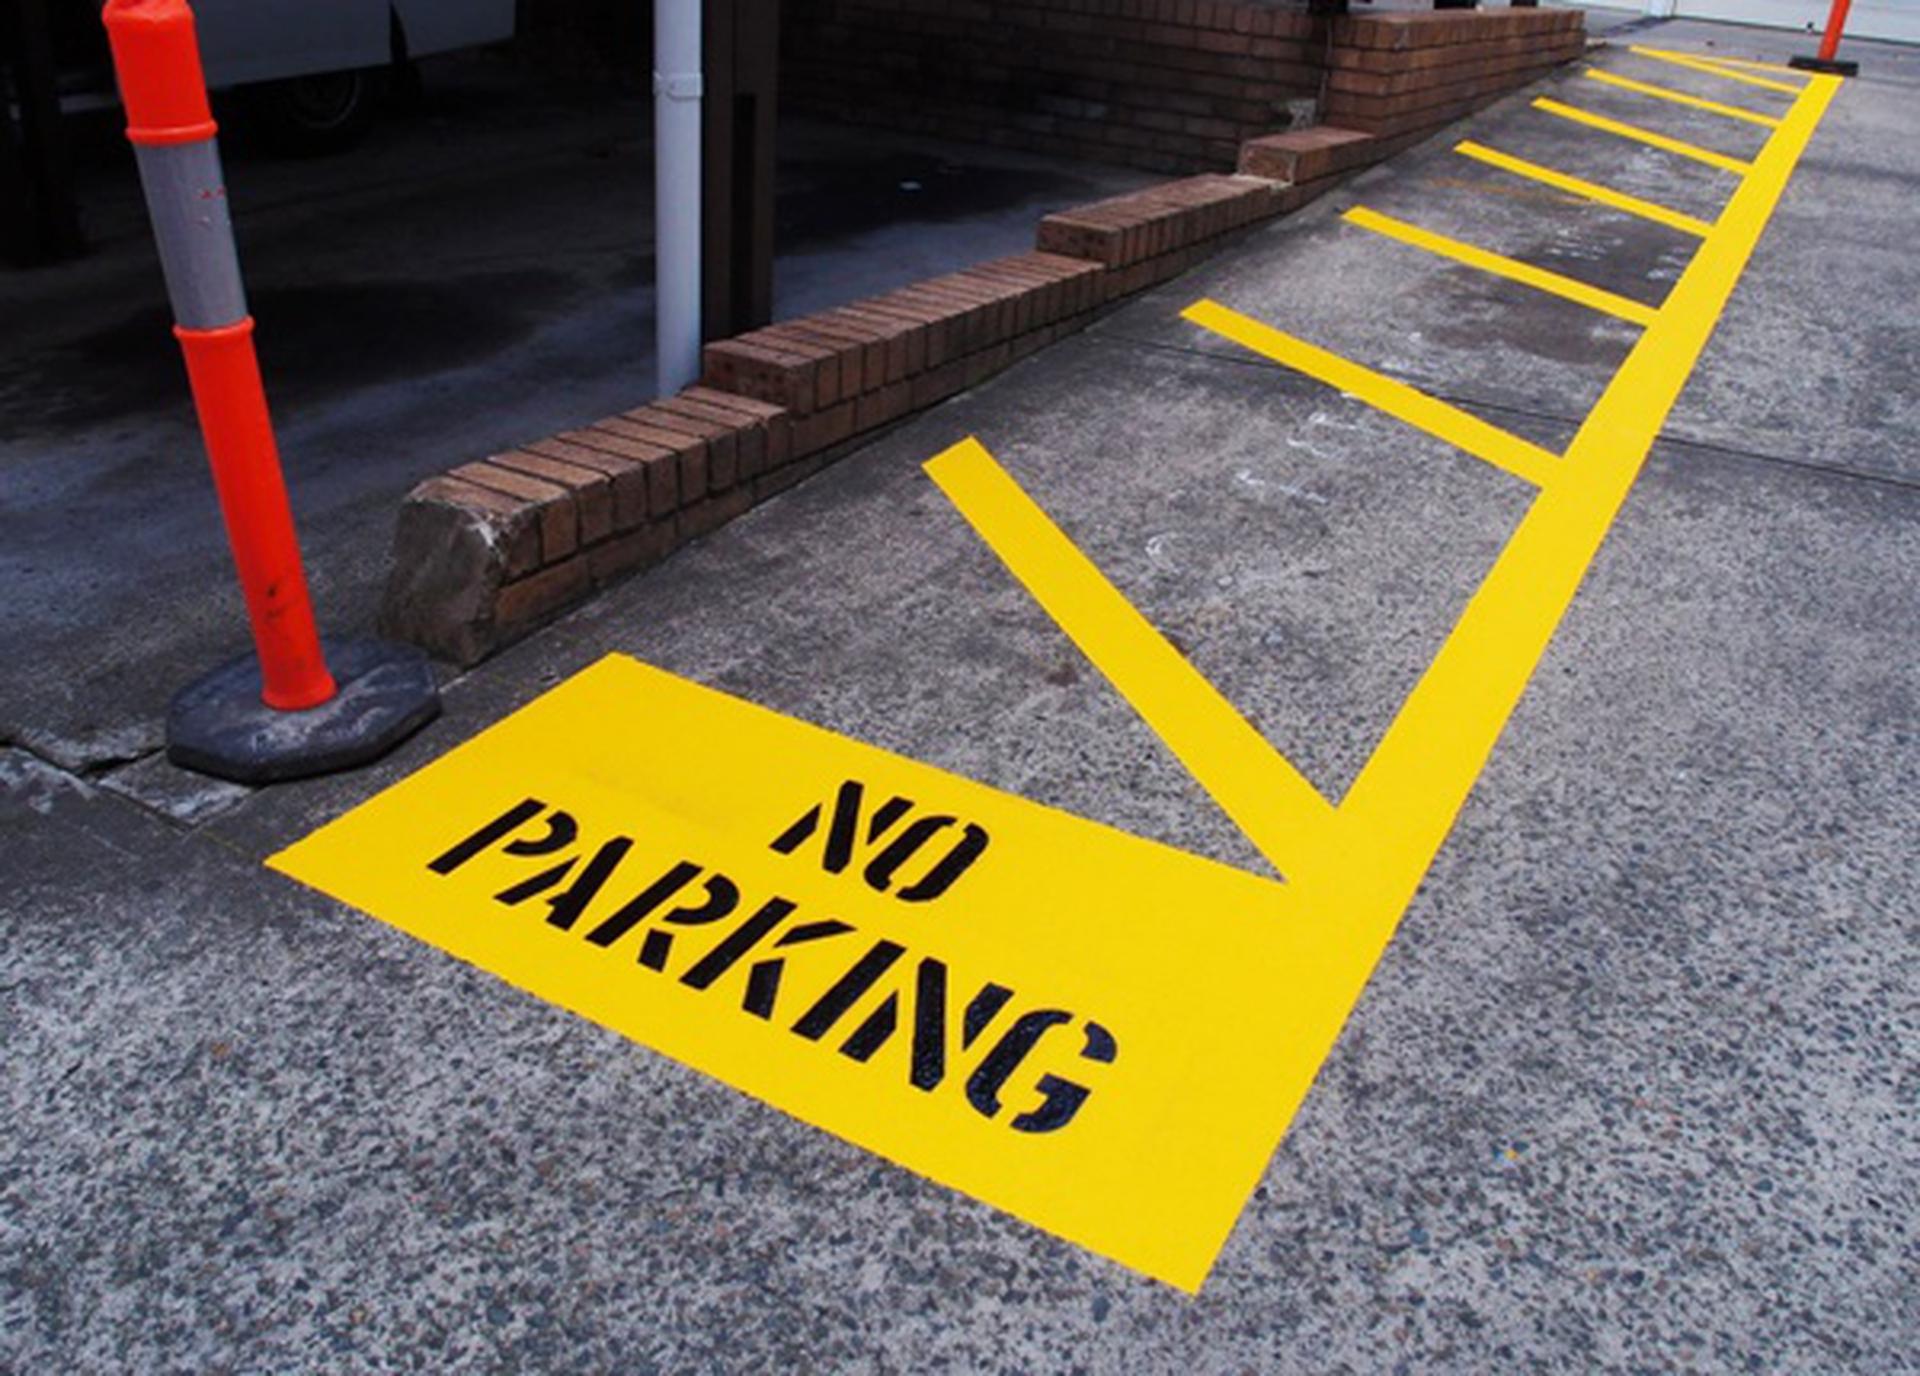 No Parking Road Markings